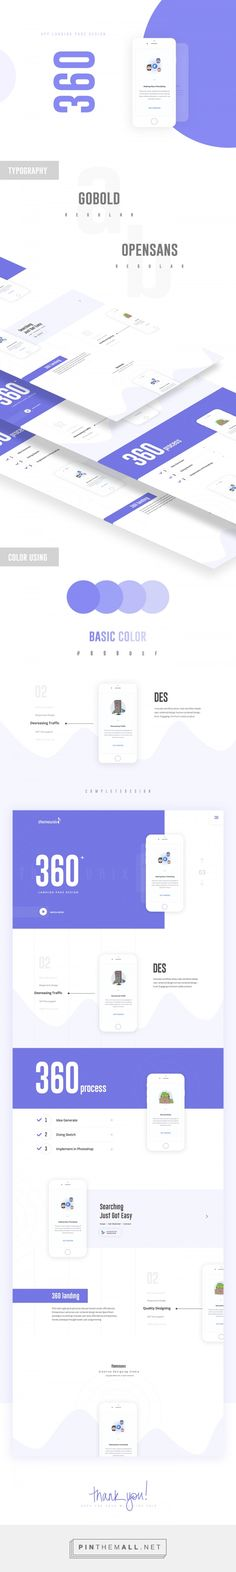 Themeunix: 360 Landing Page on Behance - created via https://pinthemall.net